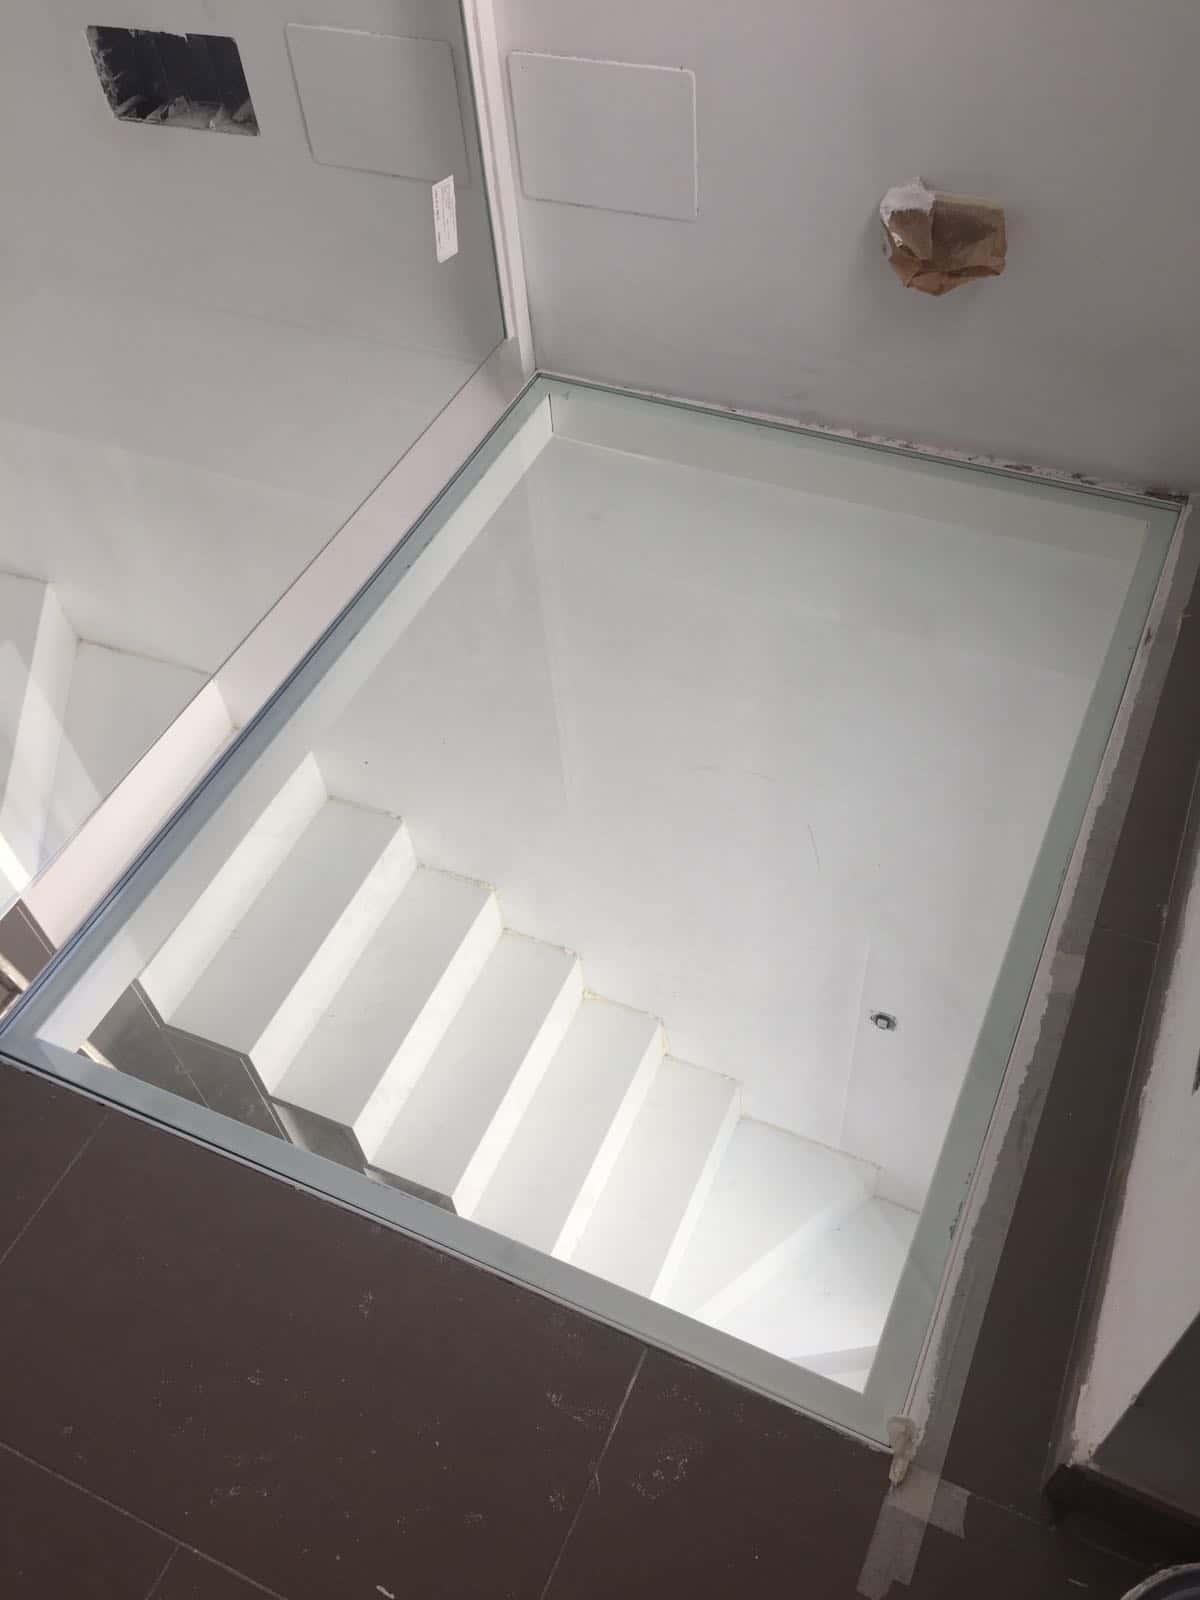 baranda con suelo pisable de vidrio